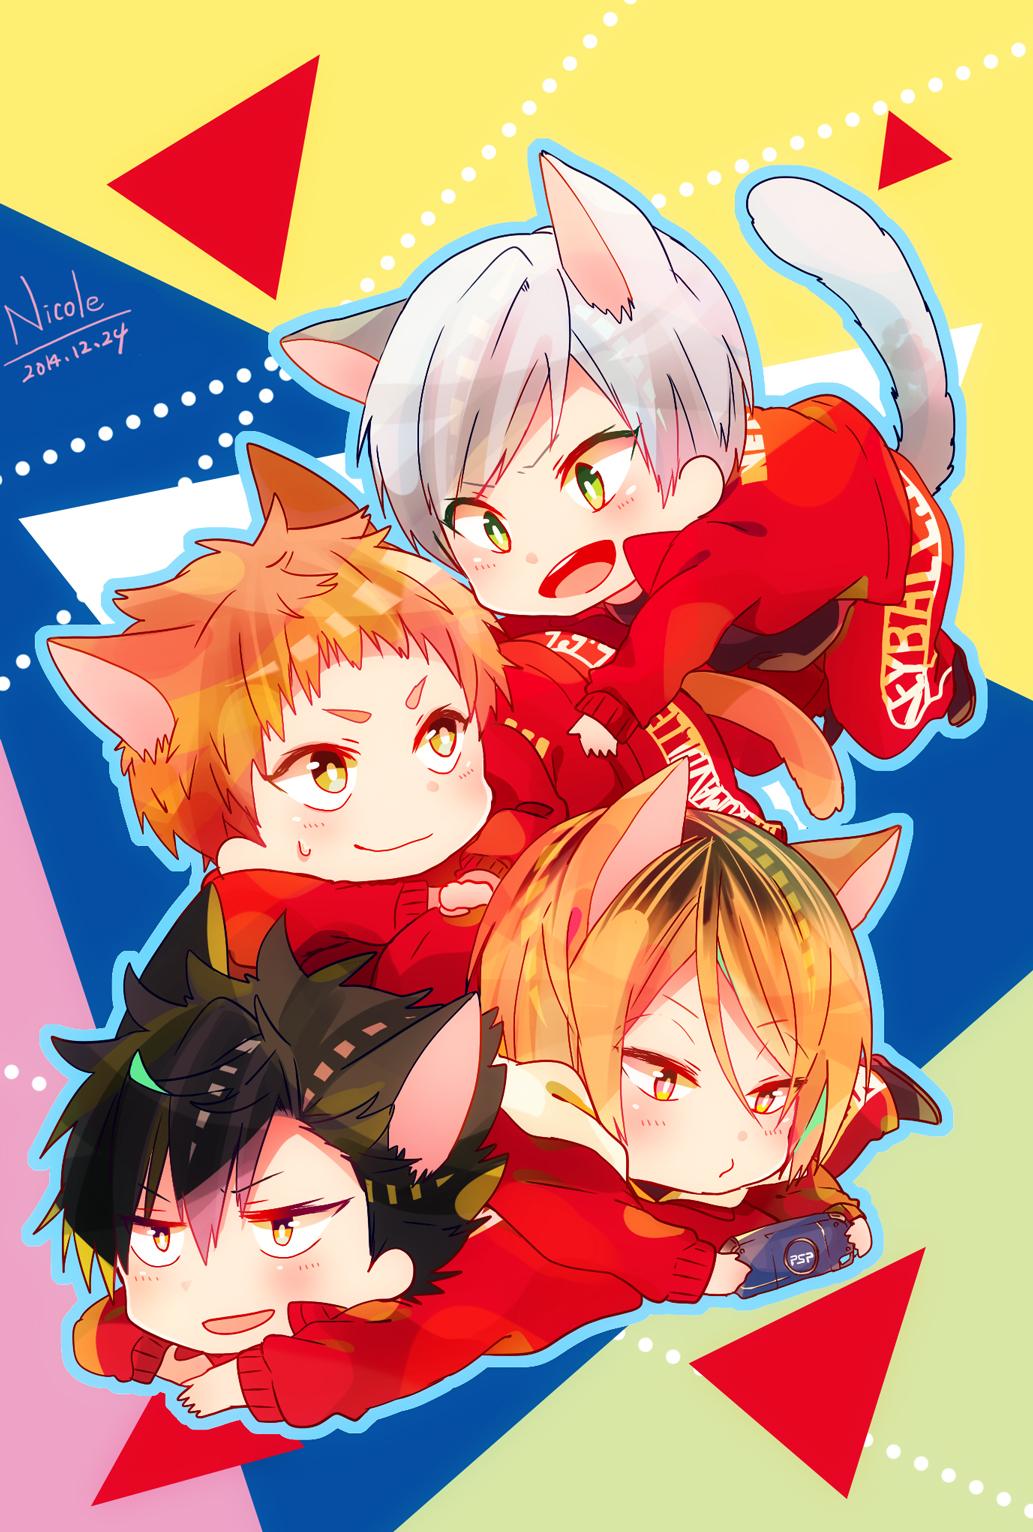 Haikyuu!! Mobile Wallpaper #1909464 - Zerochan Anime Image ...